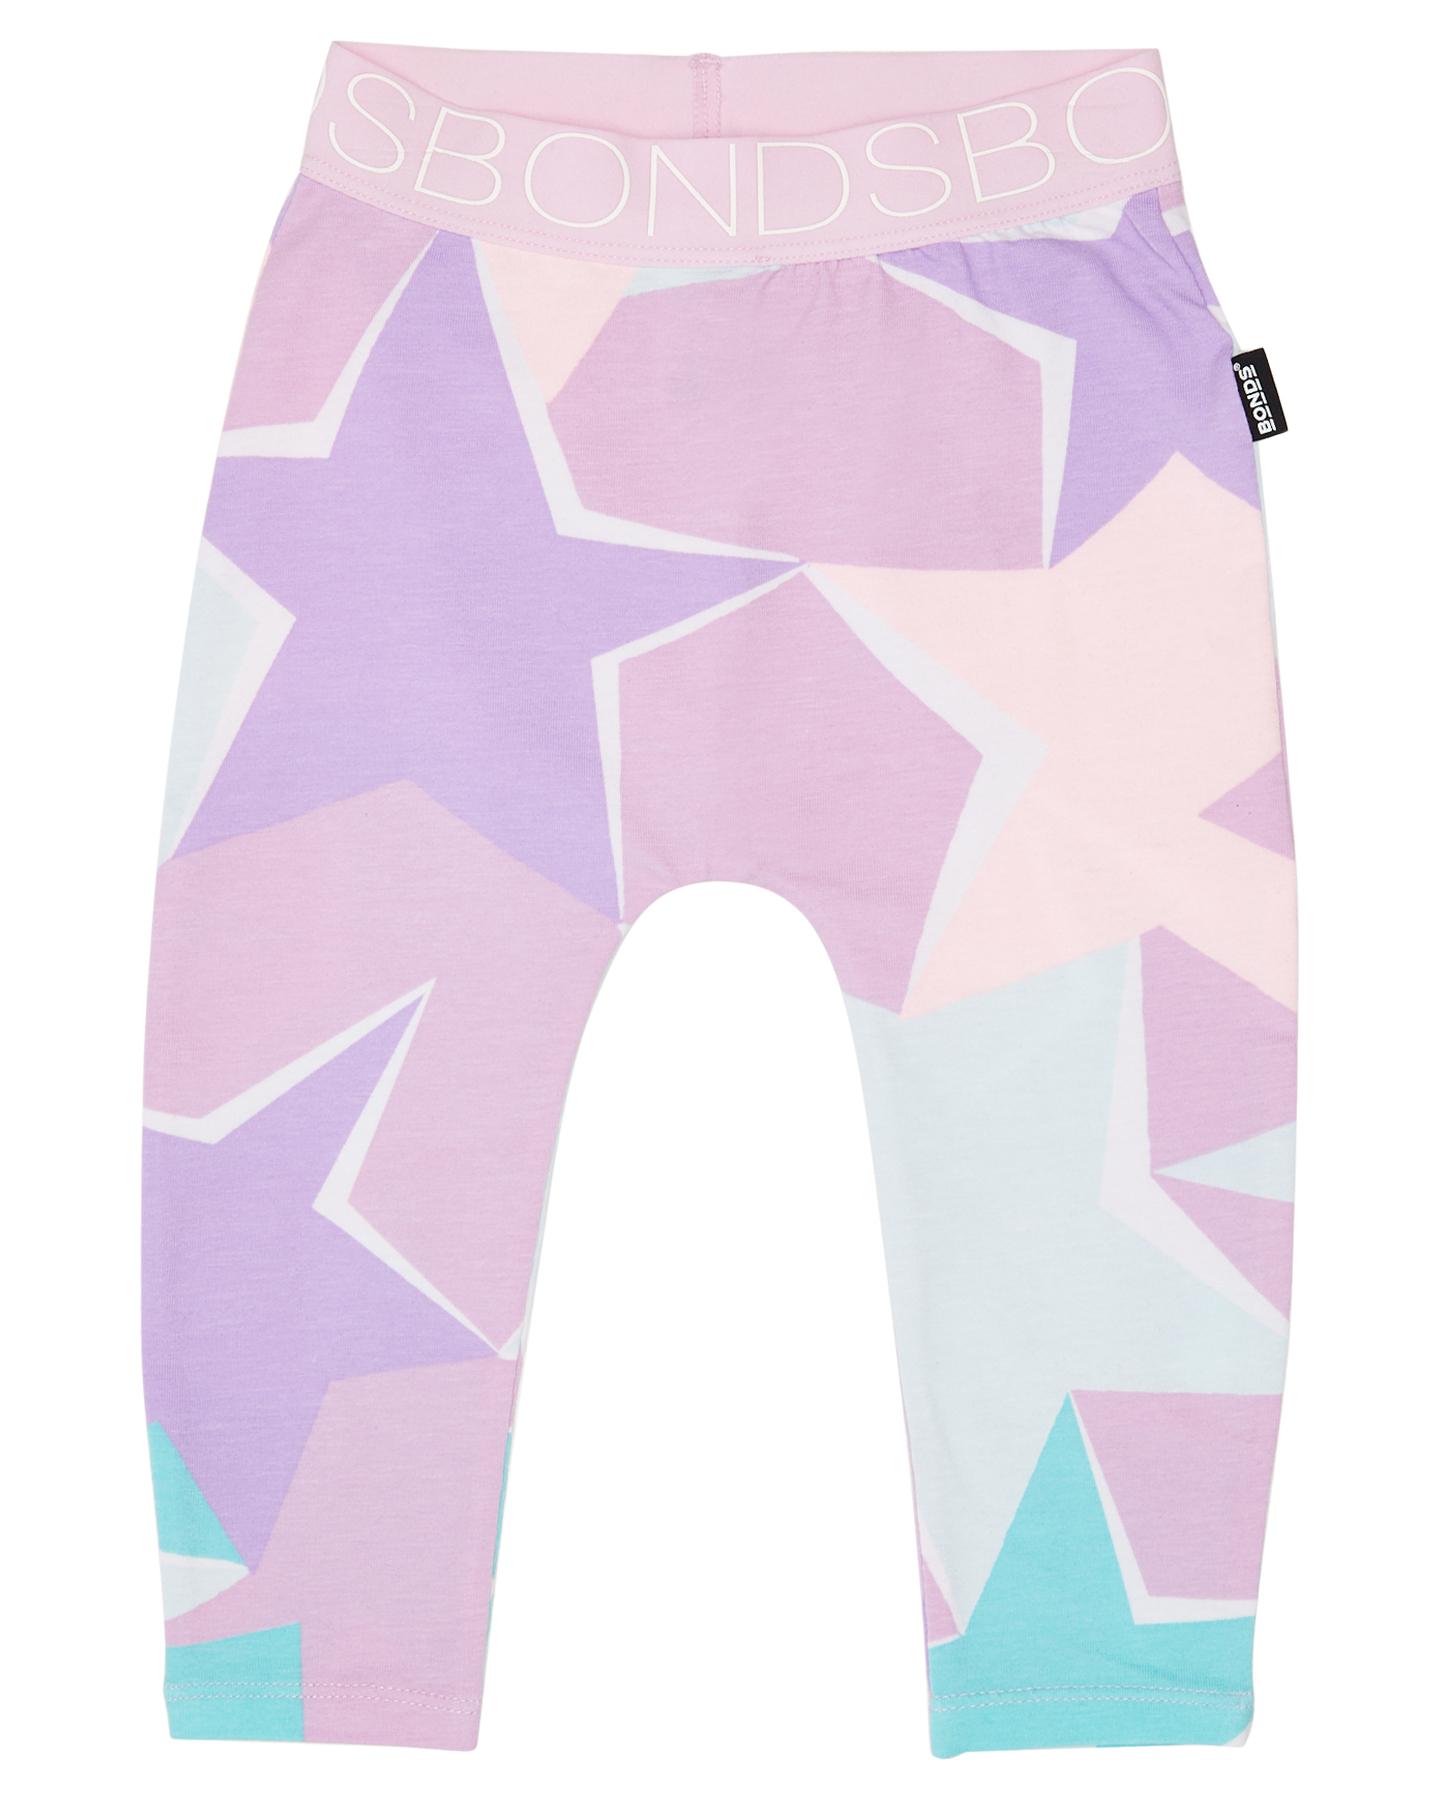 52bf145556172 Bonds Baby Girls Legging Abstract Star Pink Posy Baby Boys Clothing ...